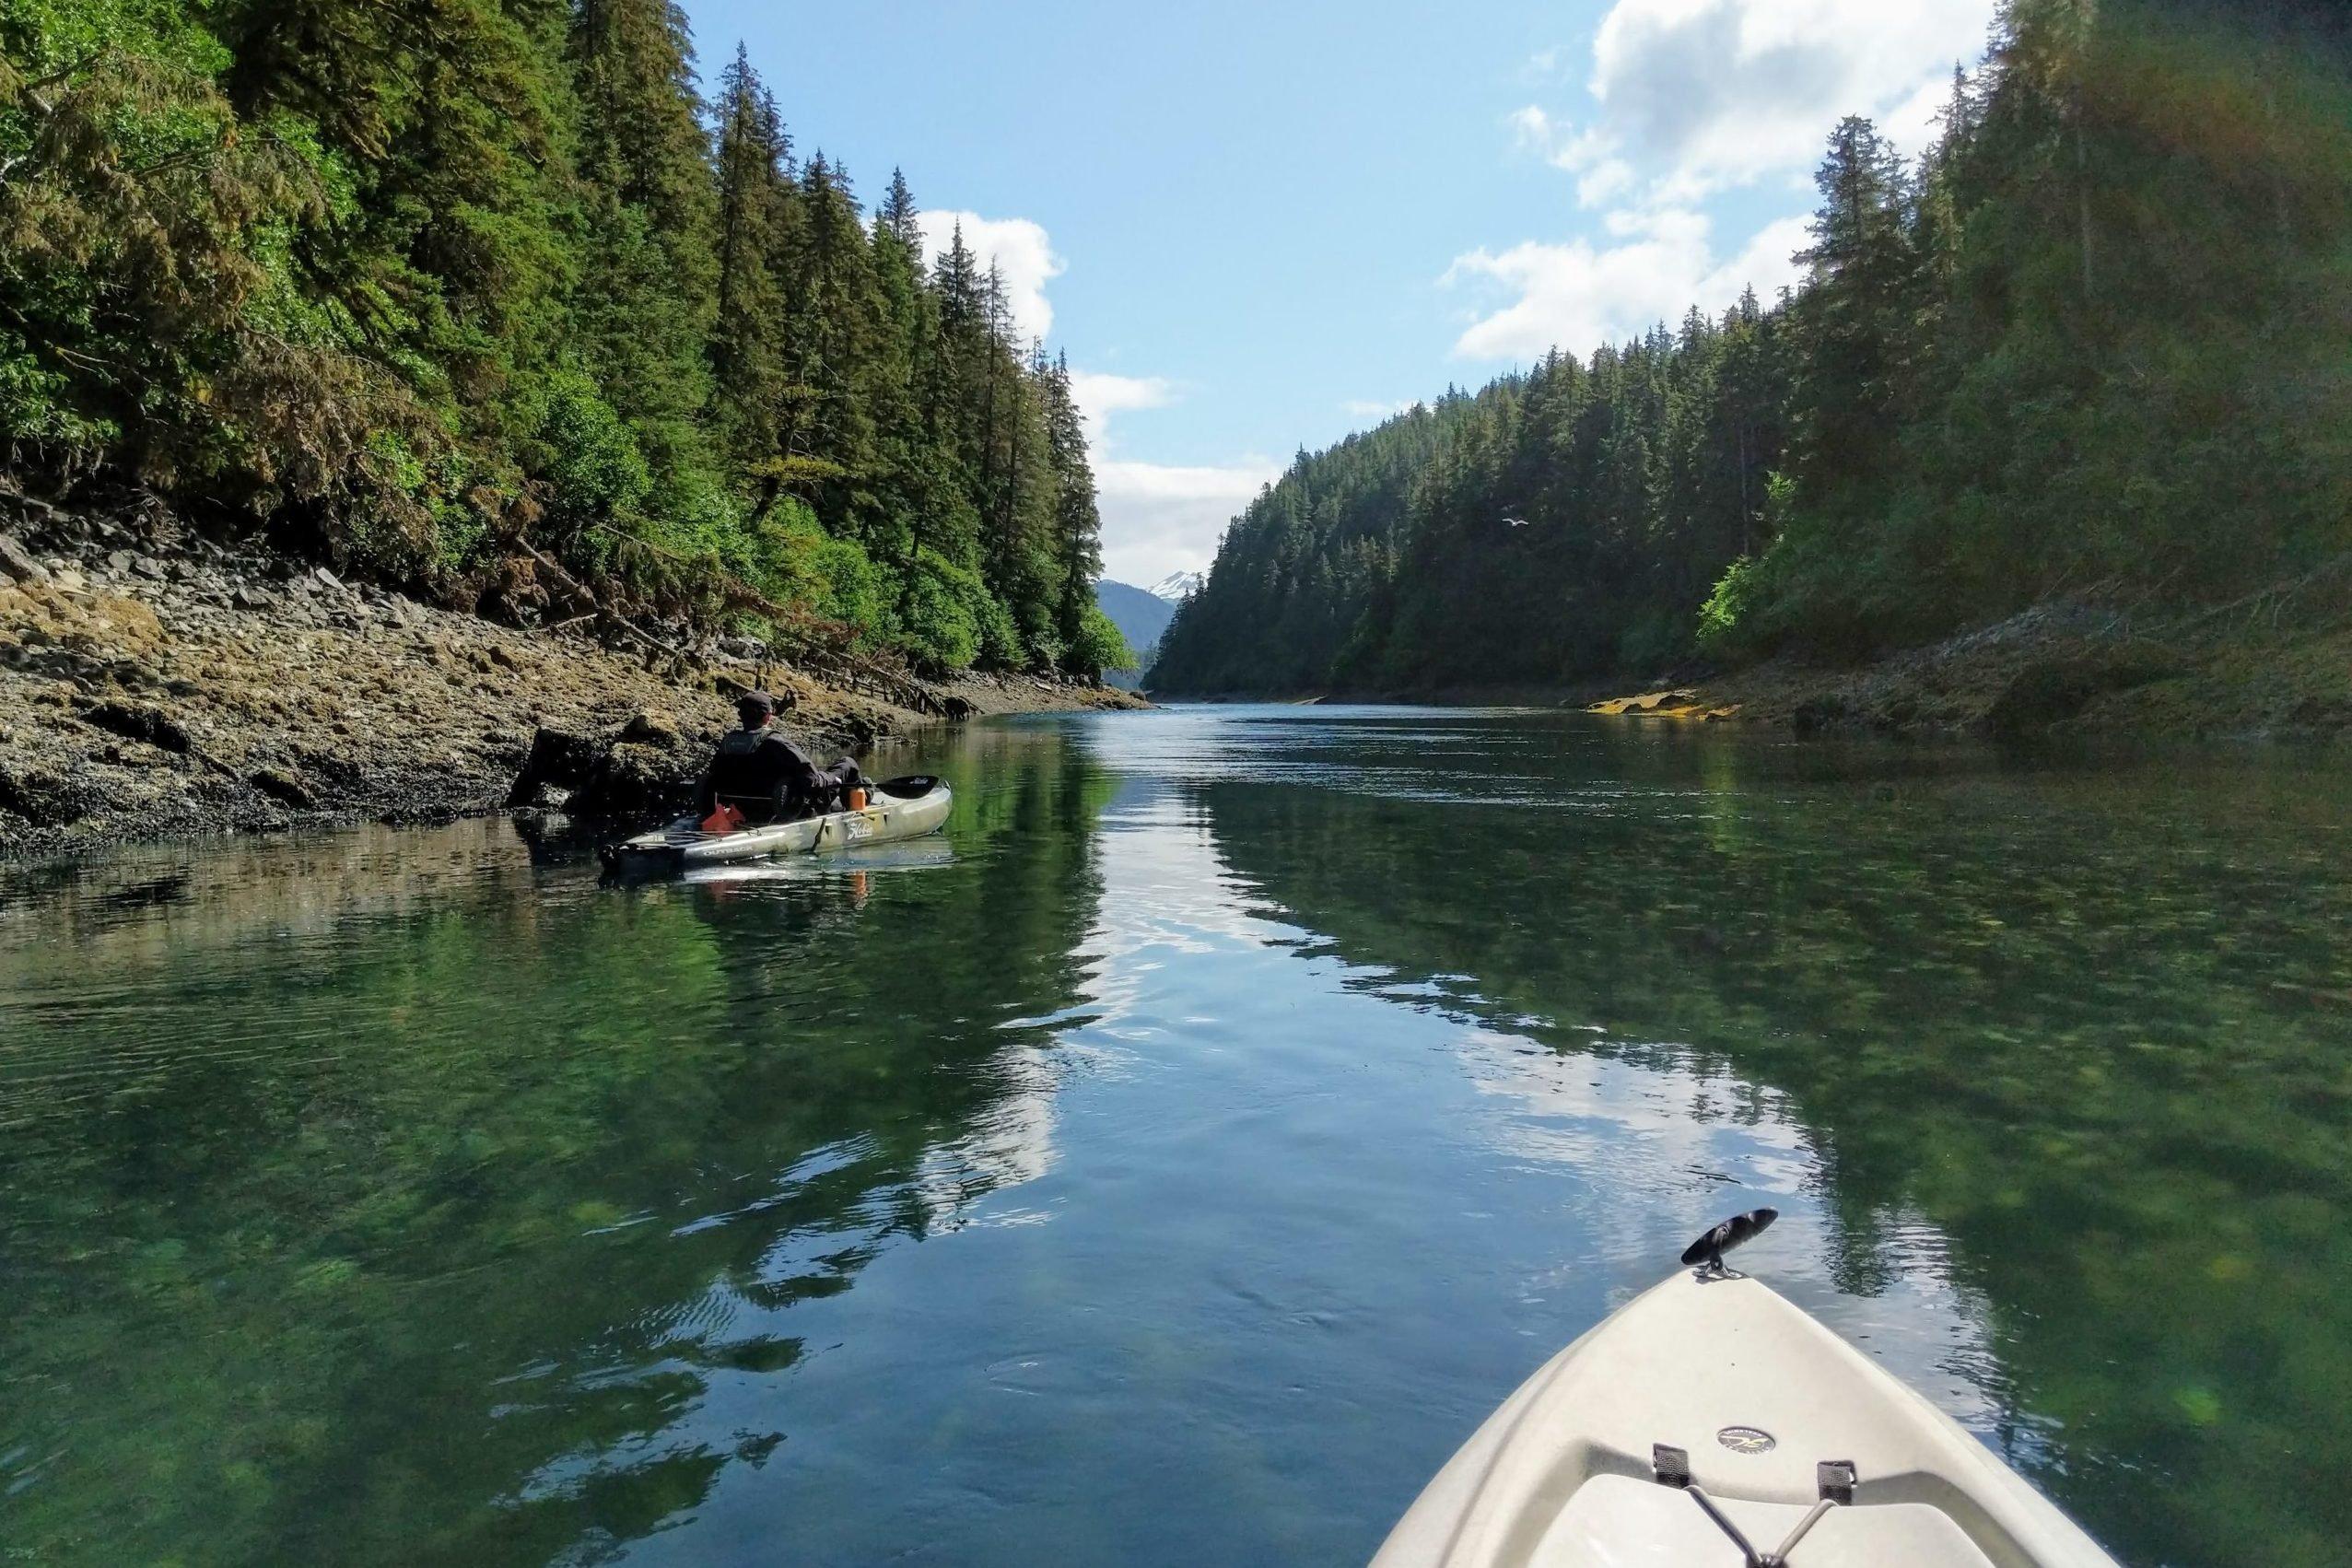 water bags road trip adventure Courtesy Denise Barlock